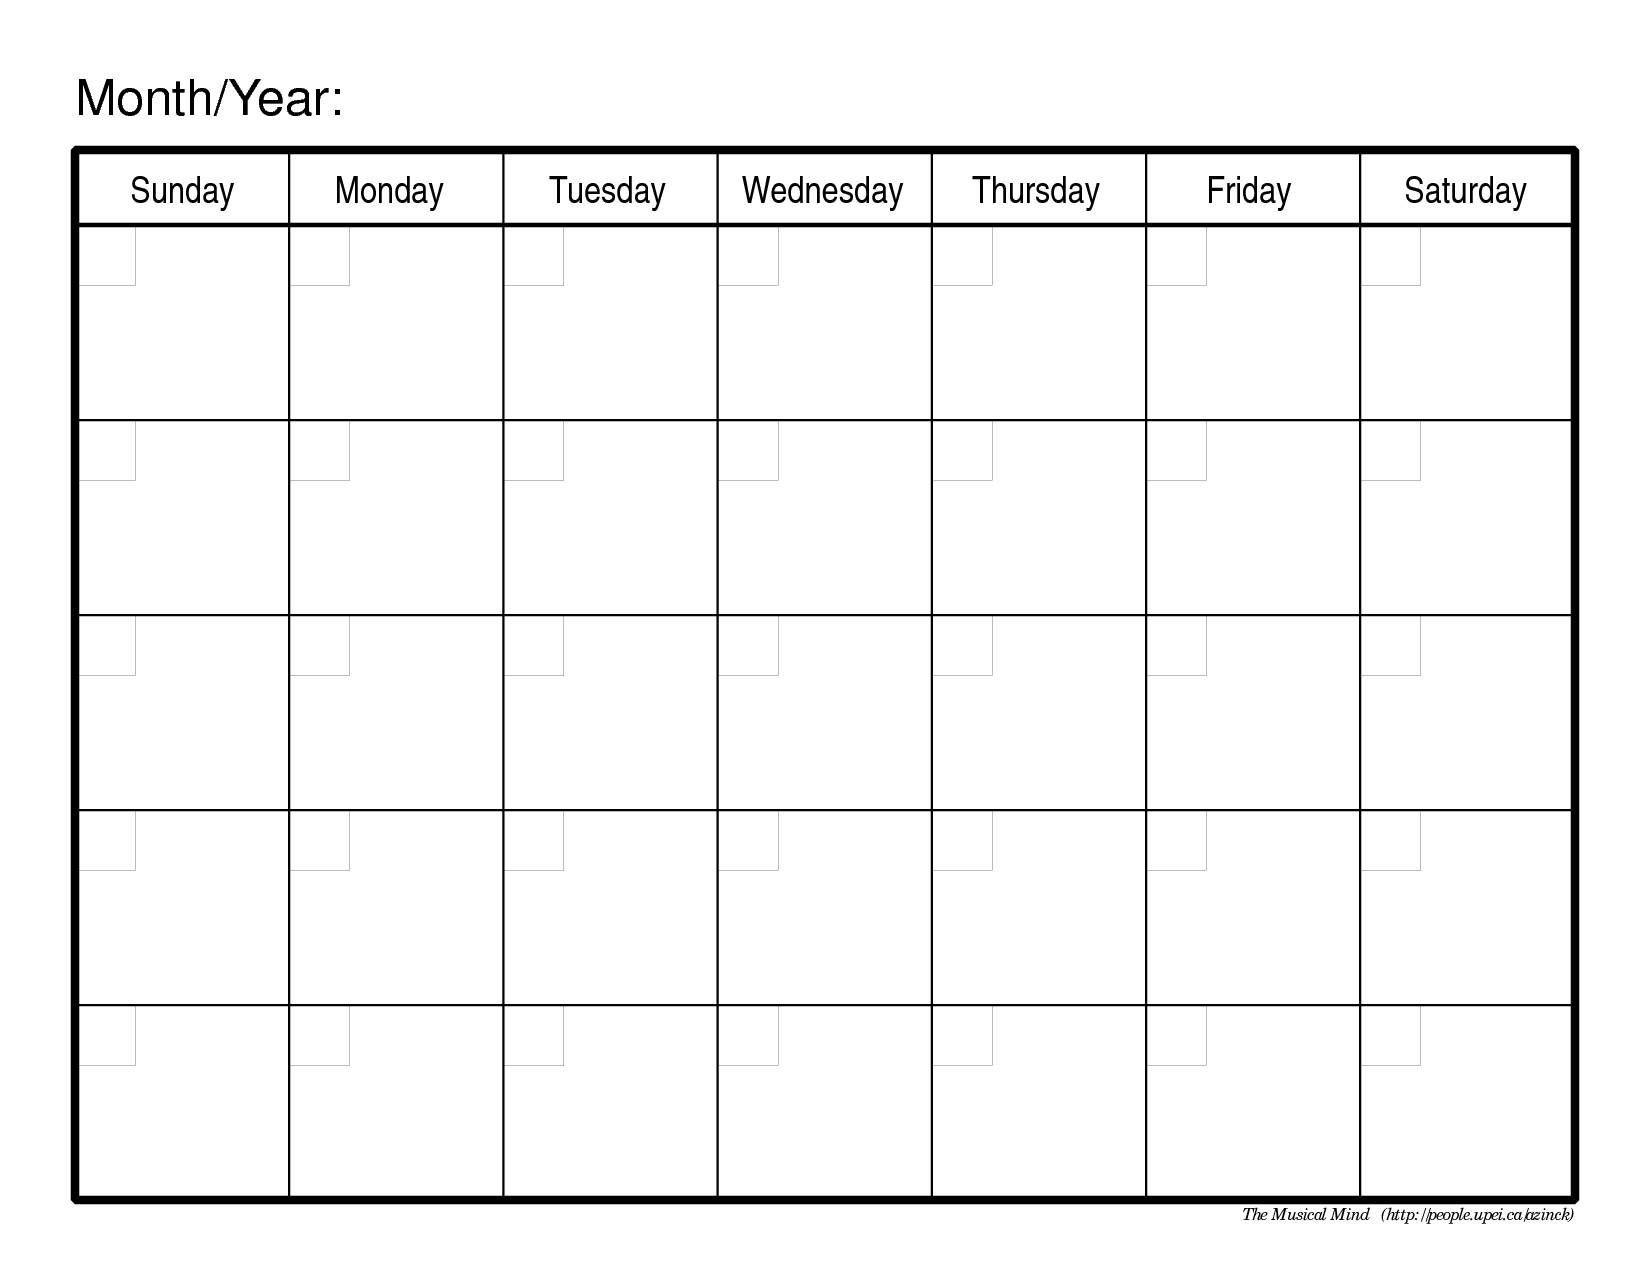 Free Calendar Templates Print - Wpa.wpart.co-Free Blank Printable Calendar Template 81/2X11